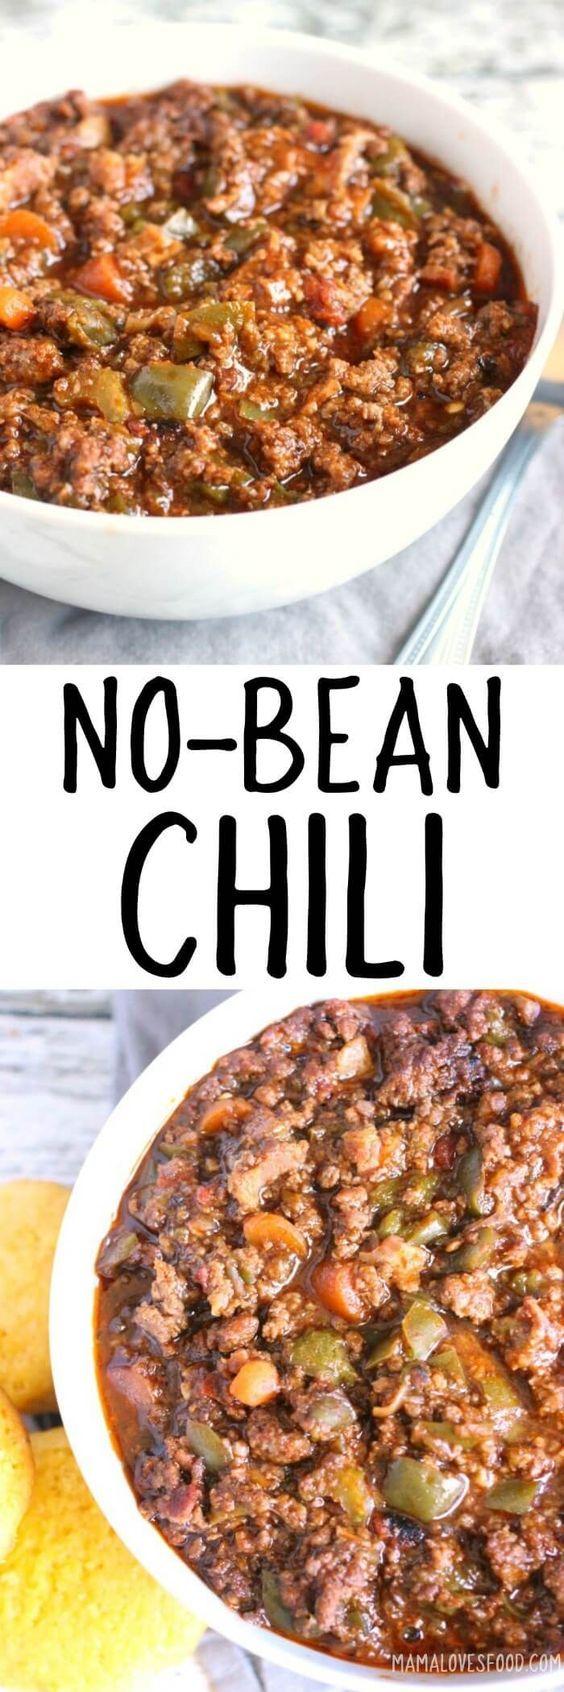 Chili Recipe No Beans Holy Moly Came Out So Good Chili Nobeanchili Paleo Glutenfree Chilli Recipes No Bean Chili Recipes